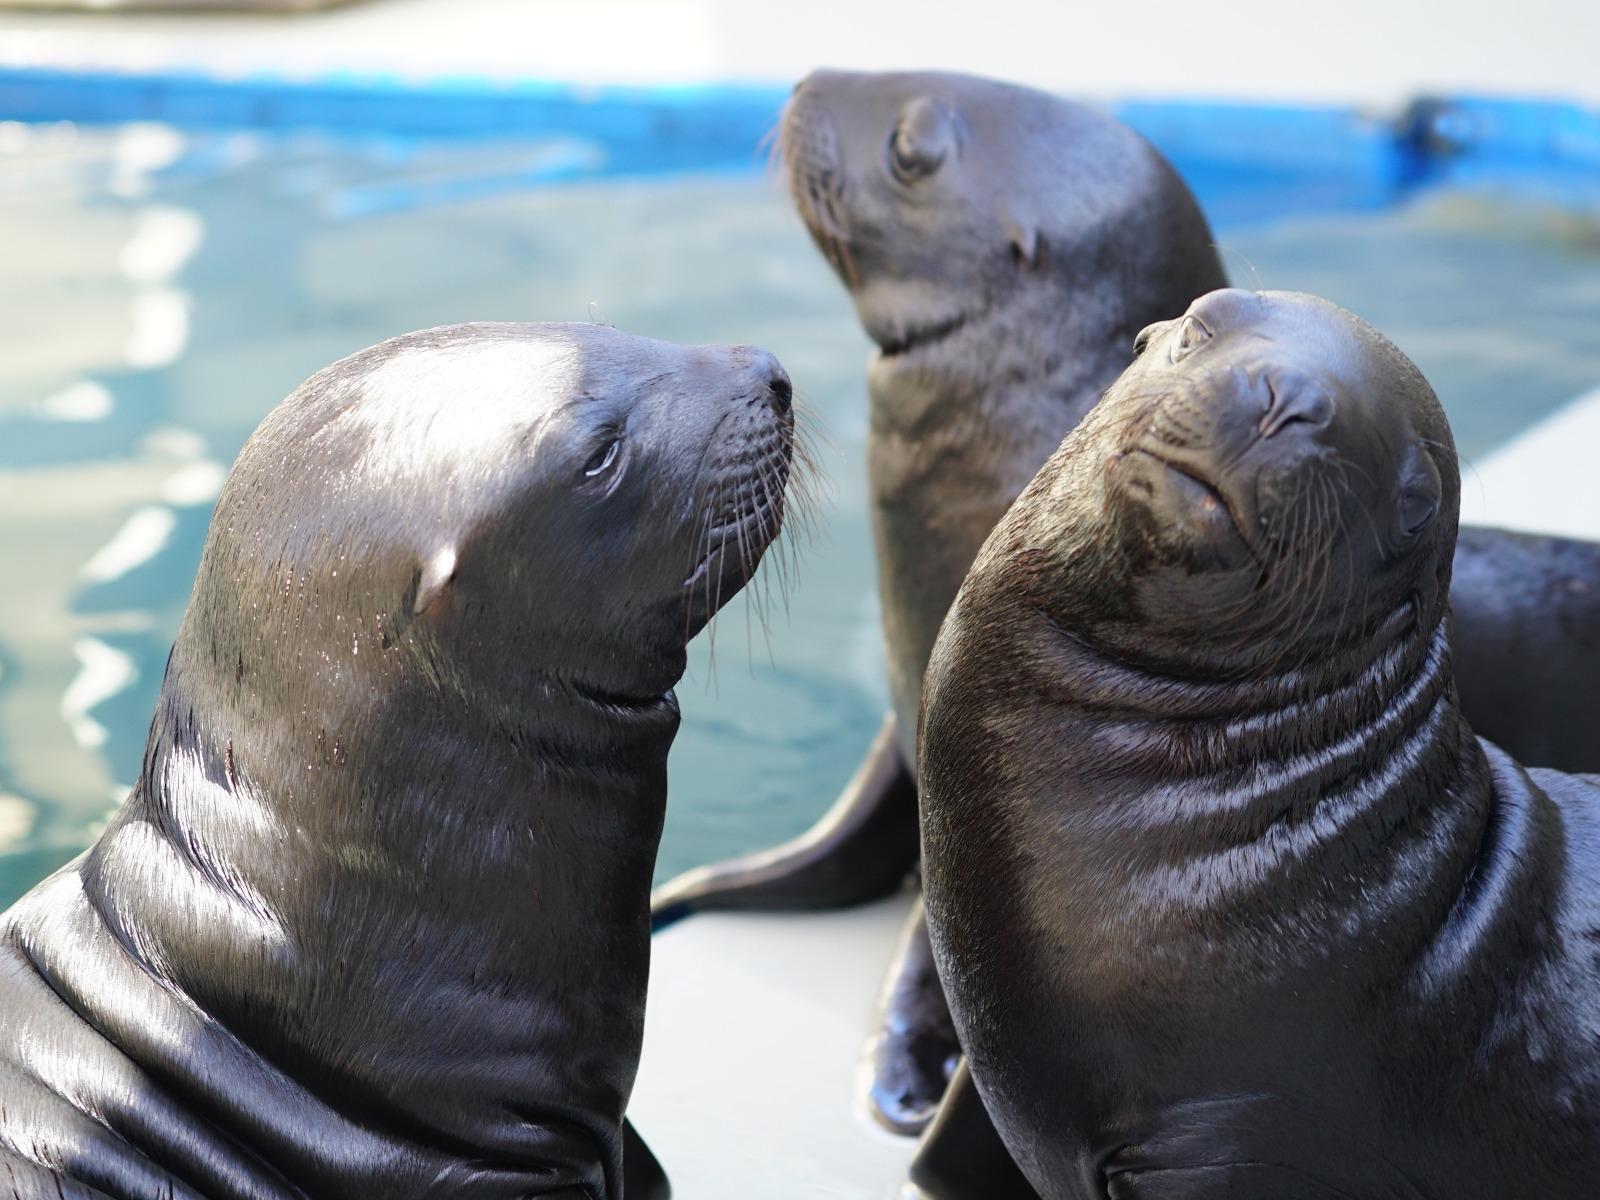 Cachorros de leones marinos